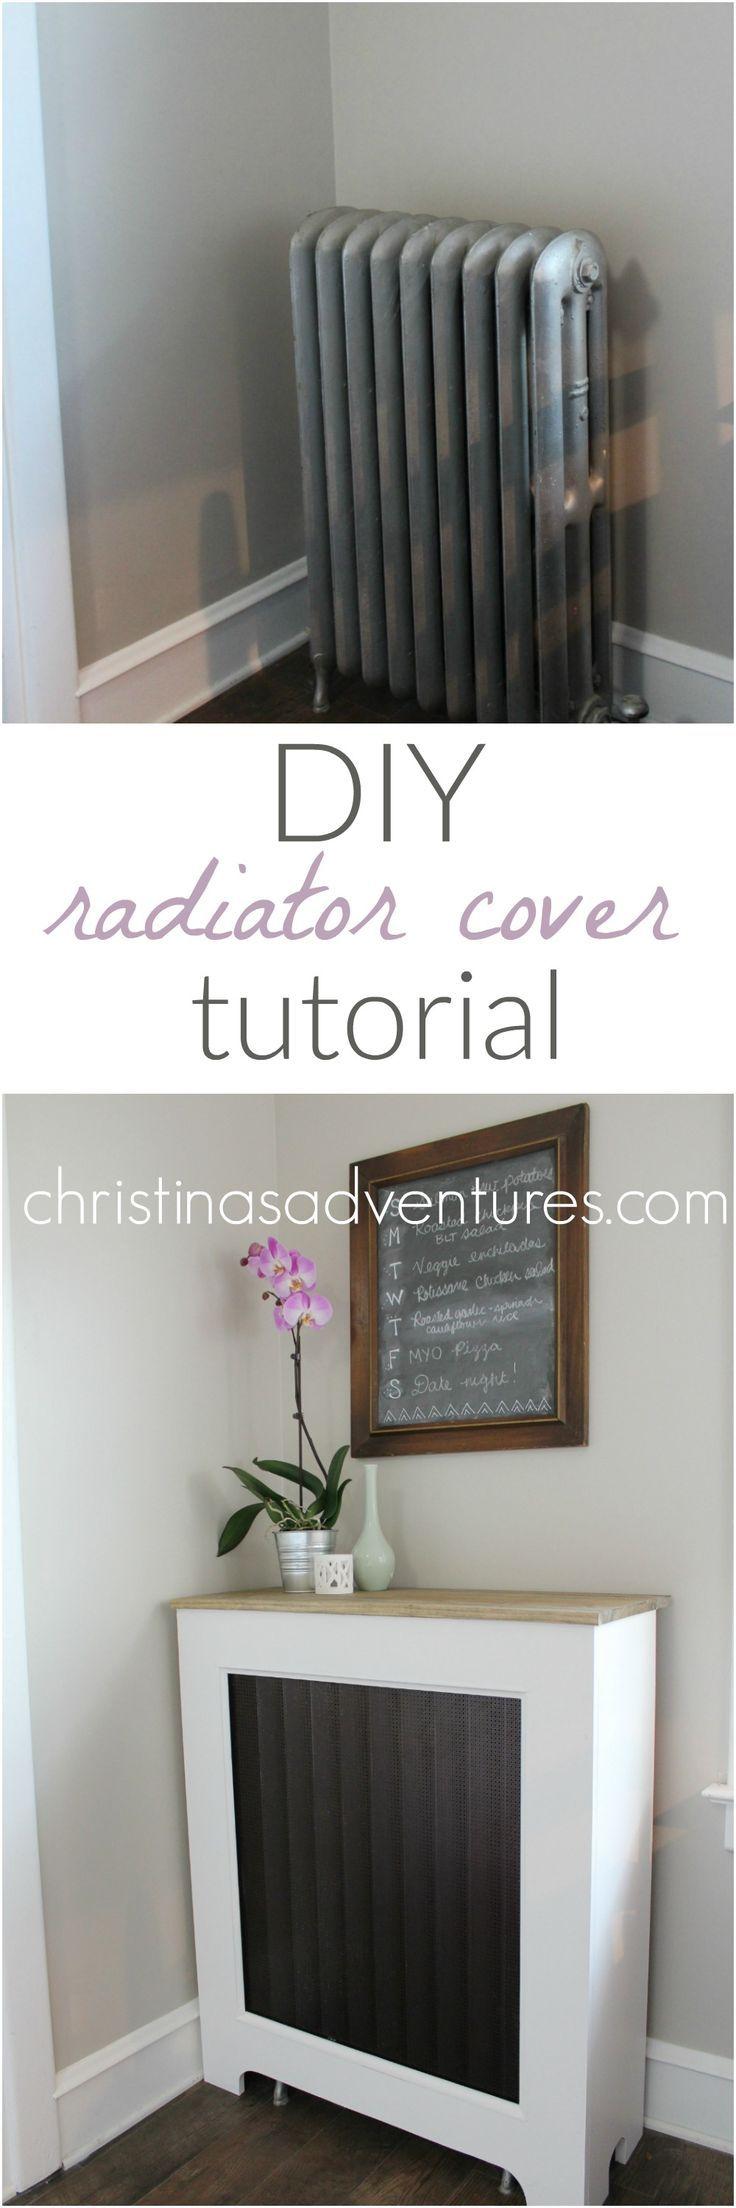 diy radiator cover tutorial gastherme heizung verstecken pinterest verstecken. Black Bedroom Furniture Sets. Home Design Ideas